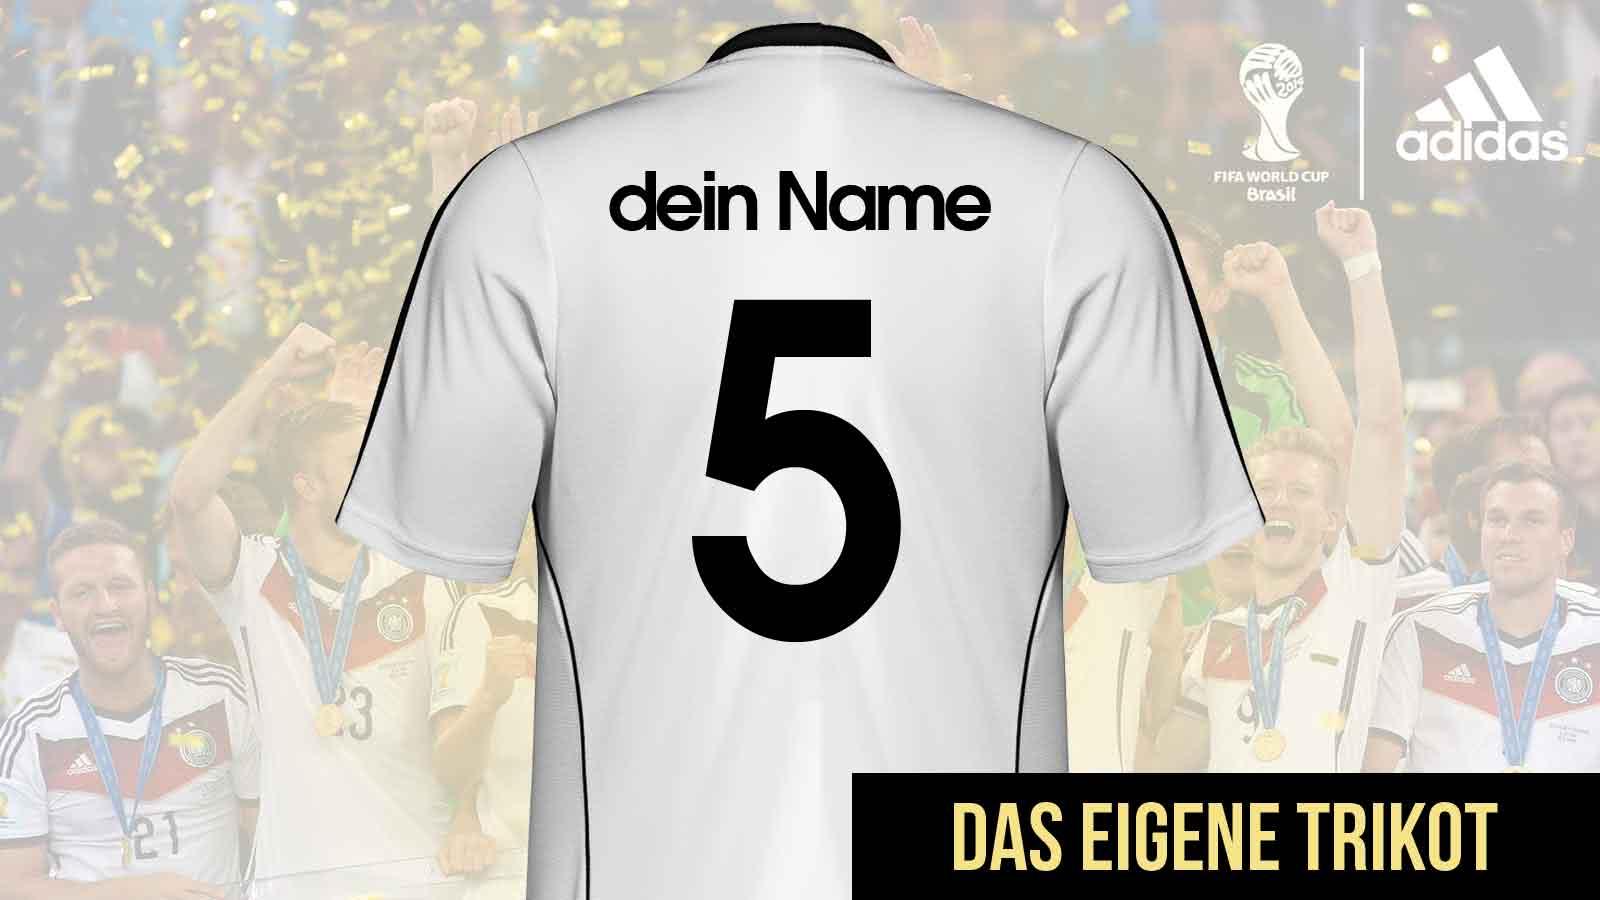 Dfb Trikot Sportartikel Und Fussballschuhe News